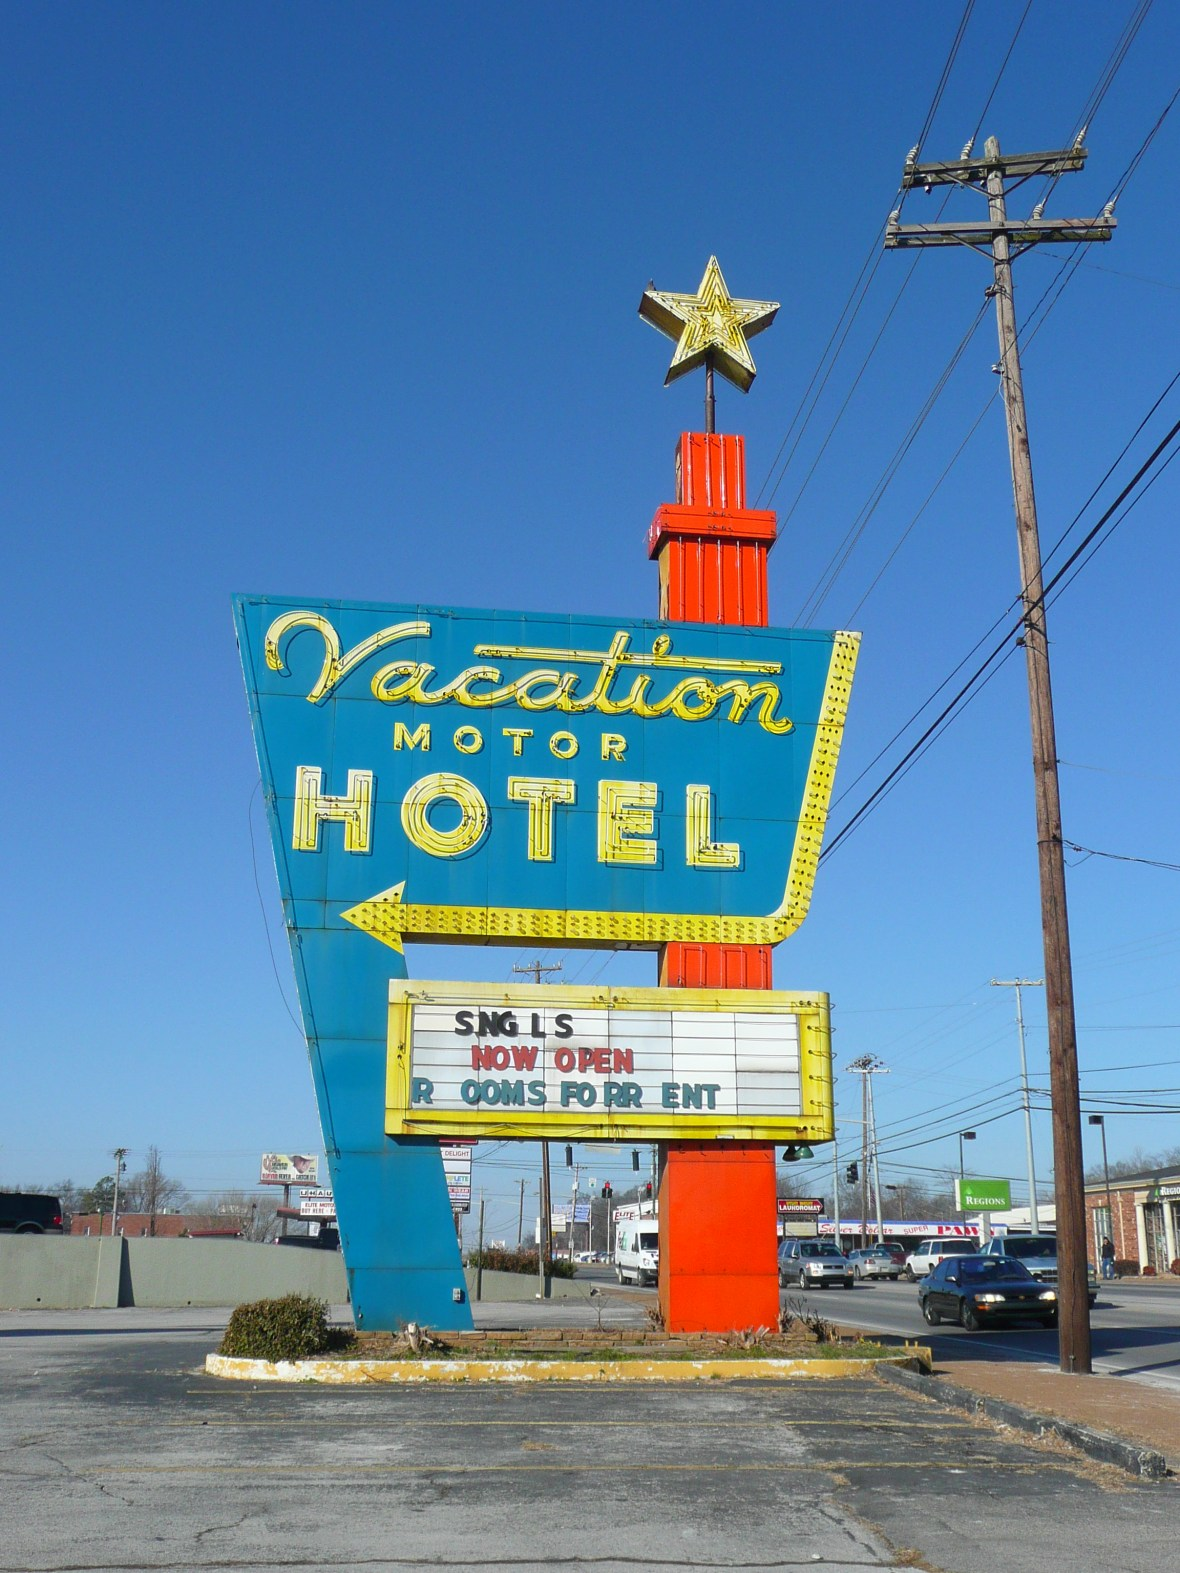 Vacation Motor Hotel - 650 Providence Boulevard, Clarksville, Tennessee U.S.A. - January 13, 2010